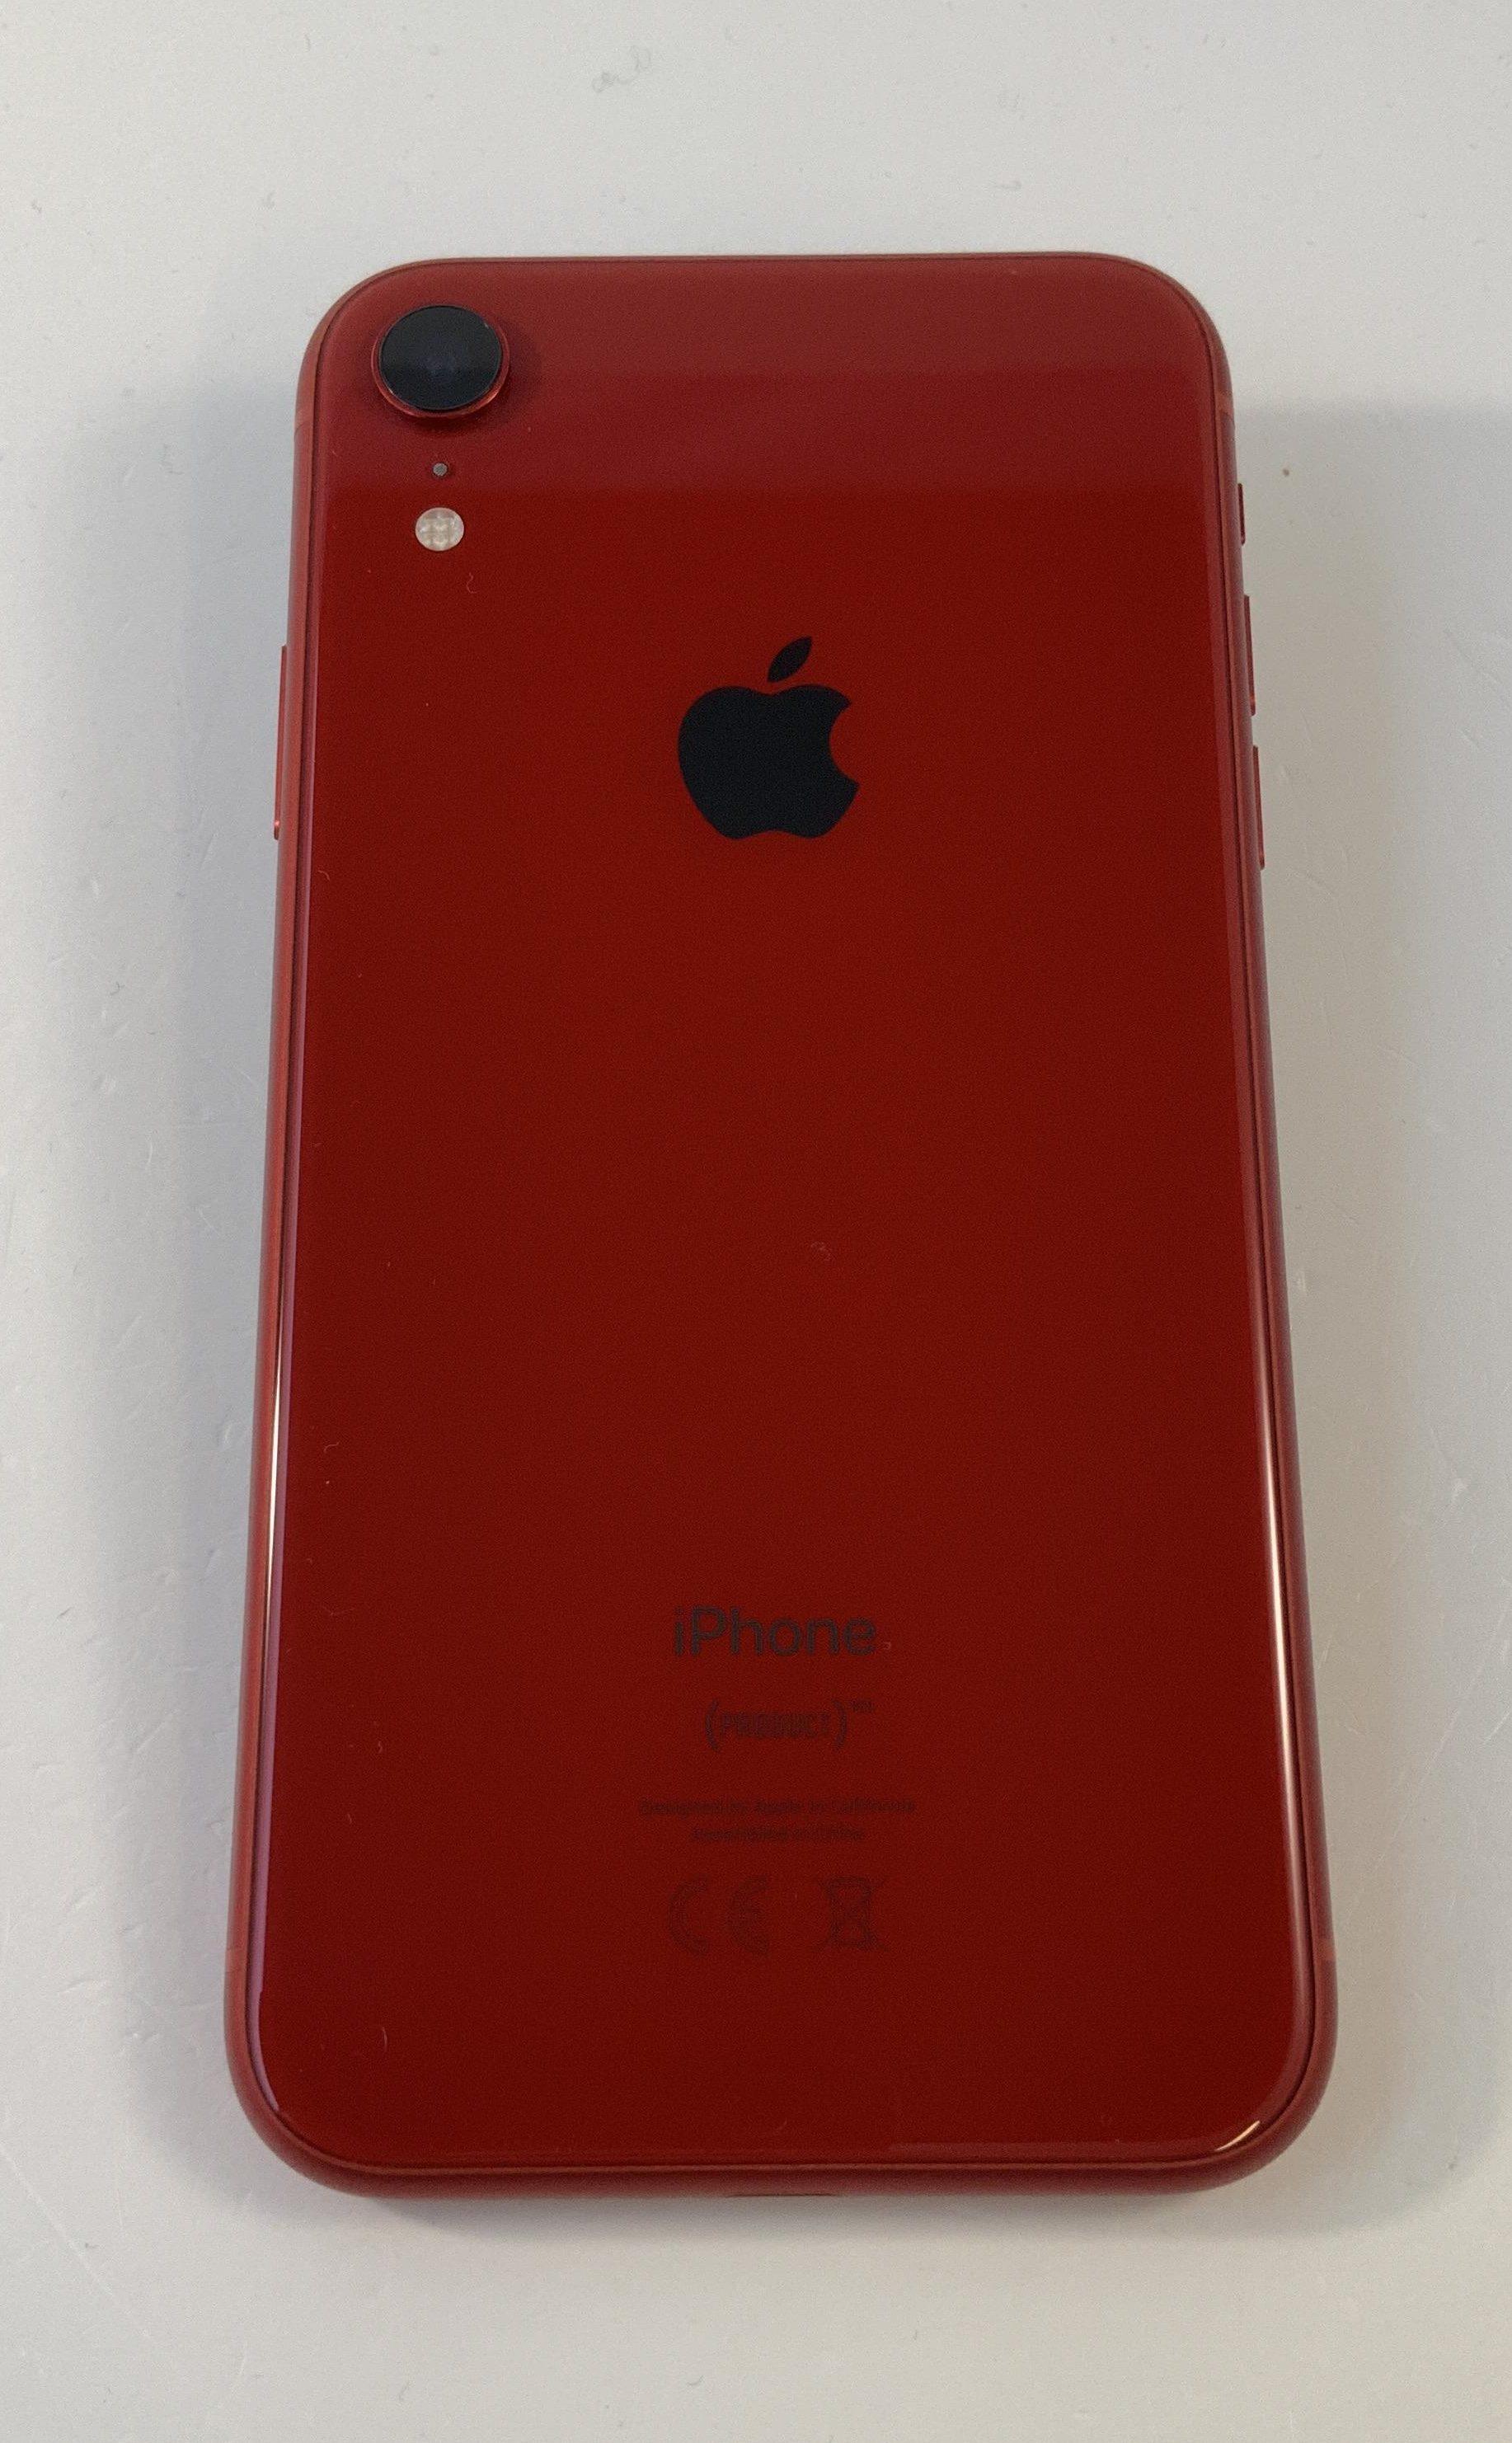 iPhone XR 128GB, 128GB, Red, immagine 2